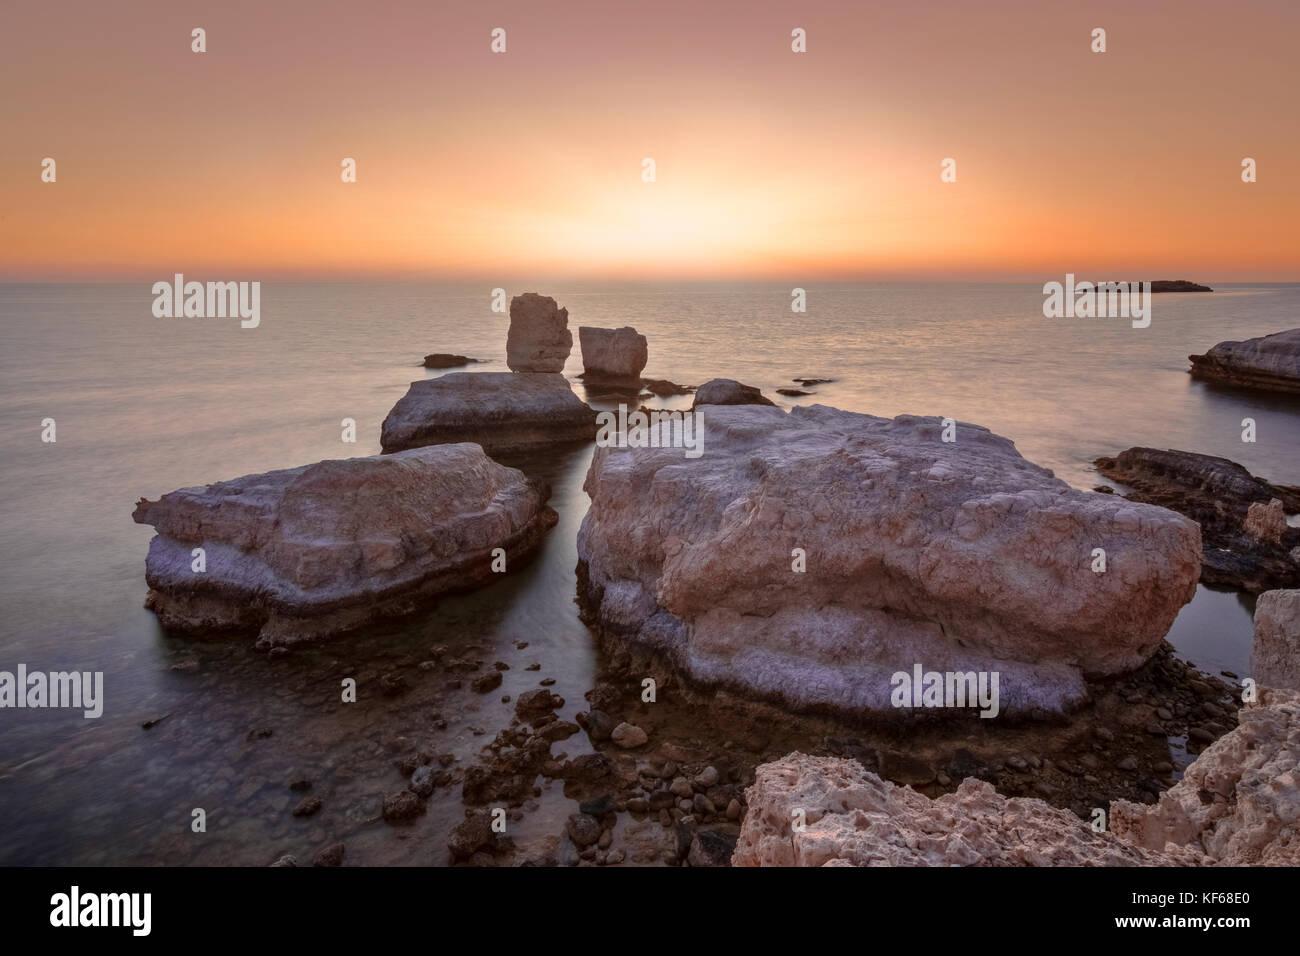 En Paphos, Chipre, pegeia Imagen De Stock